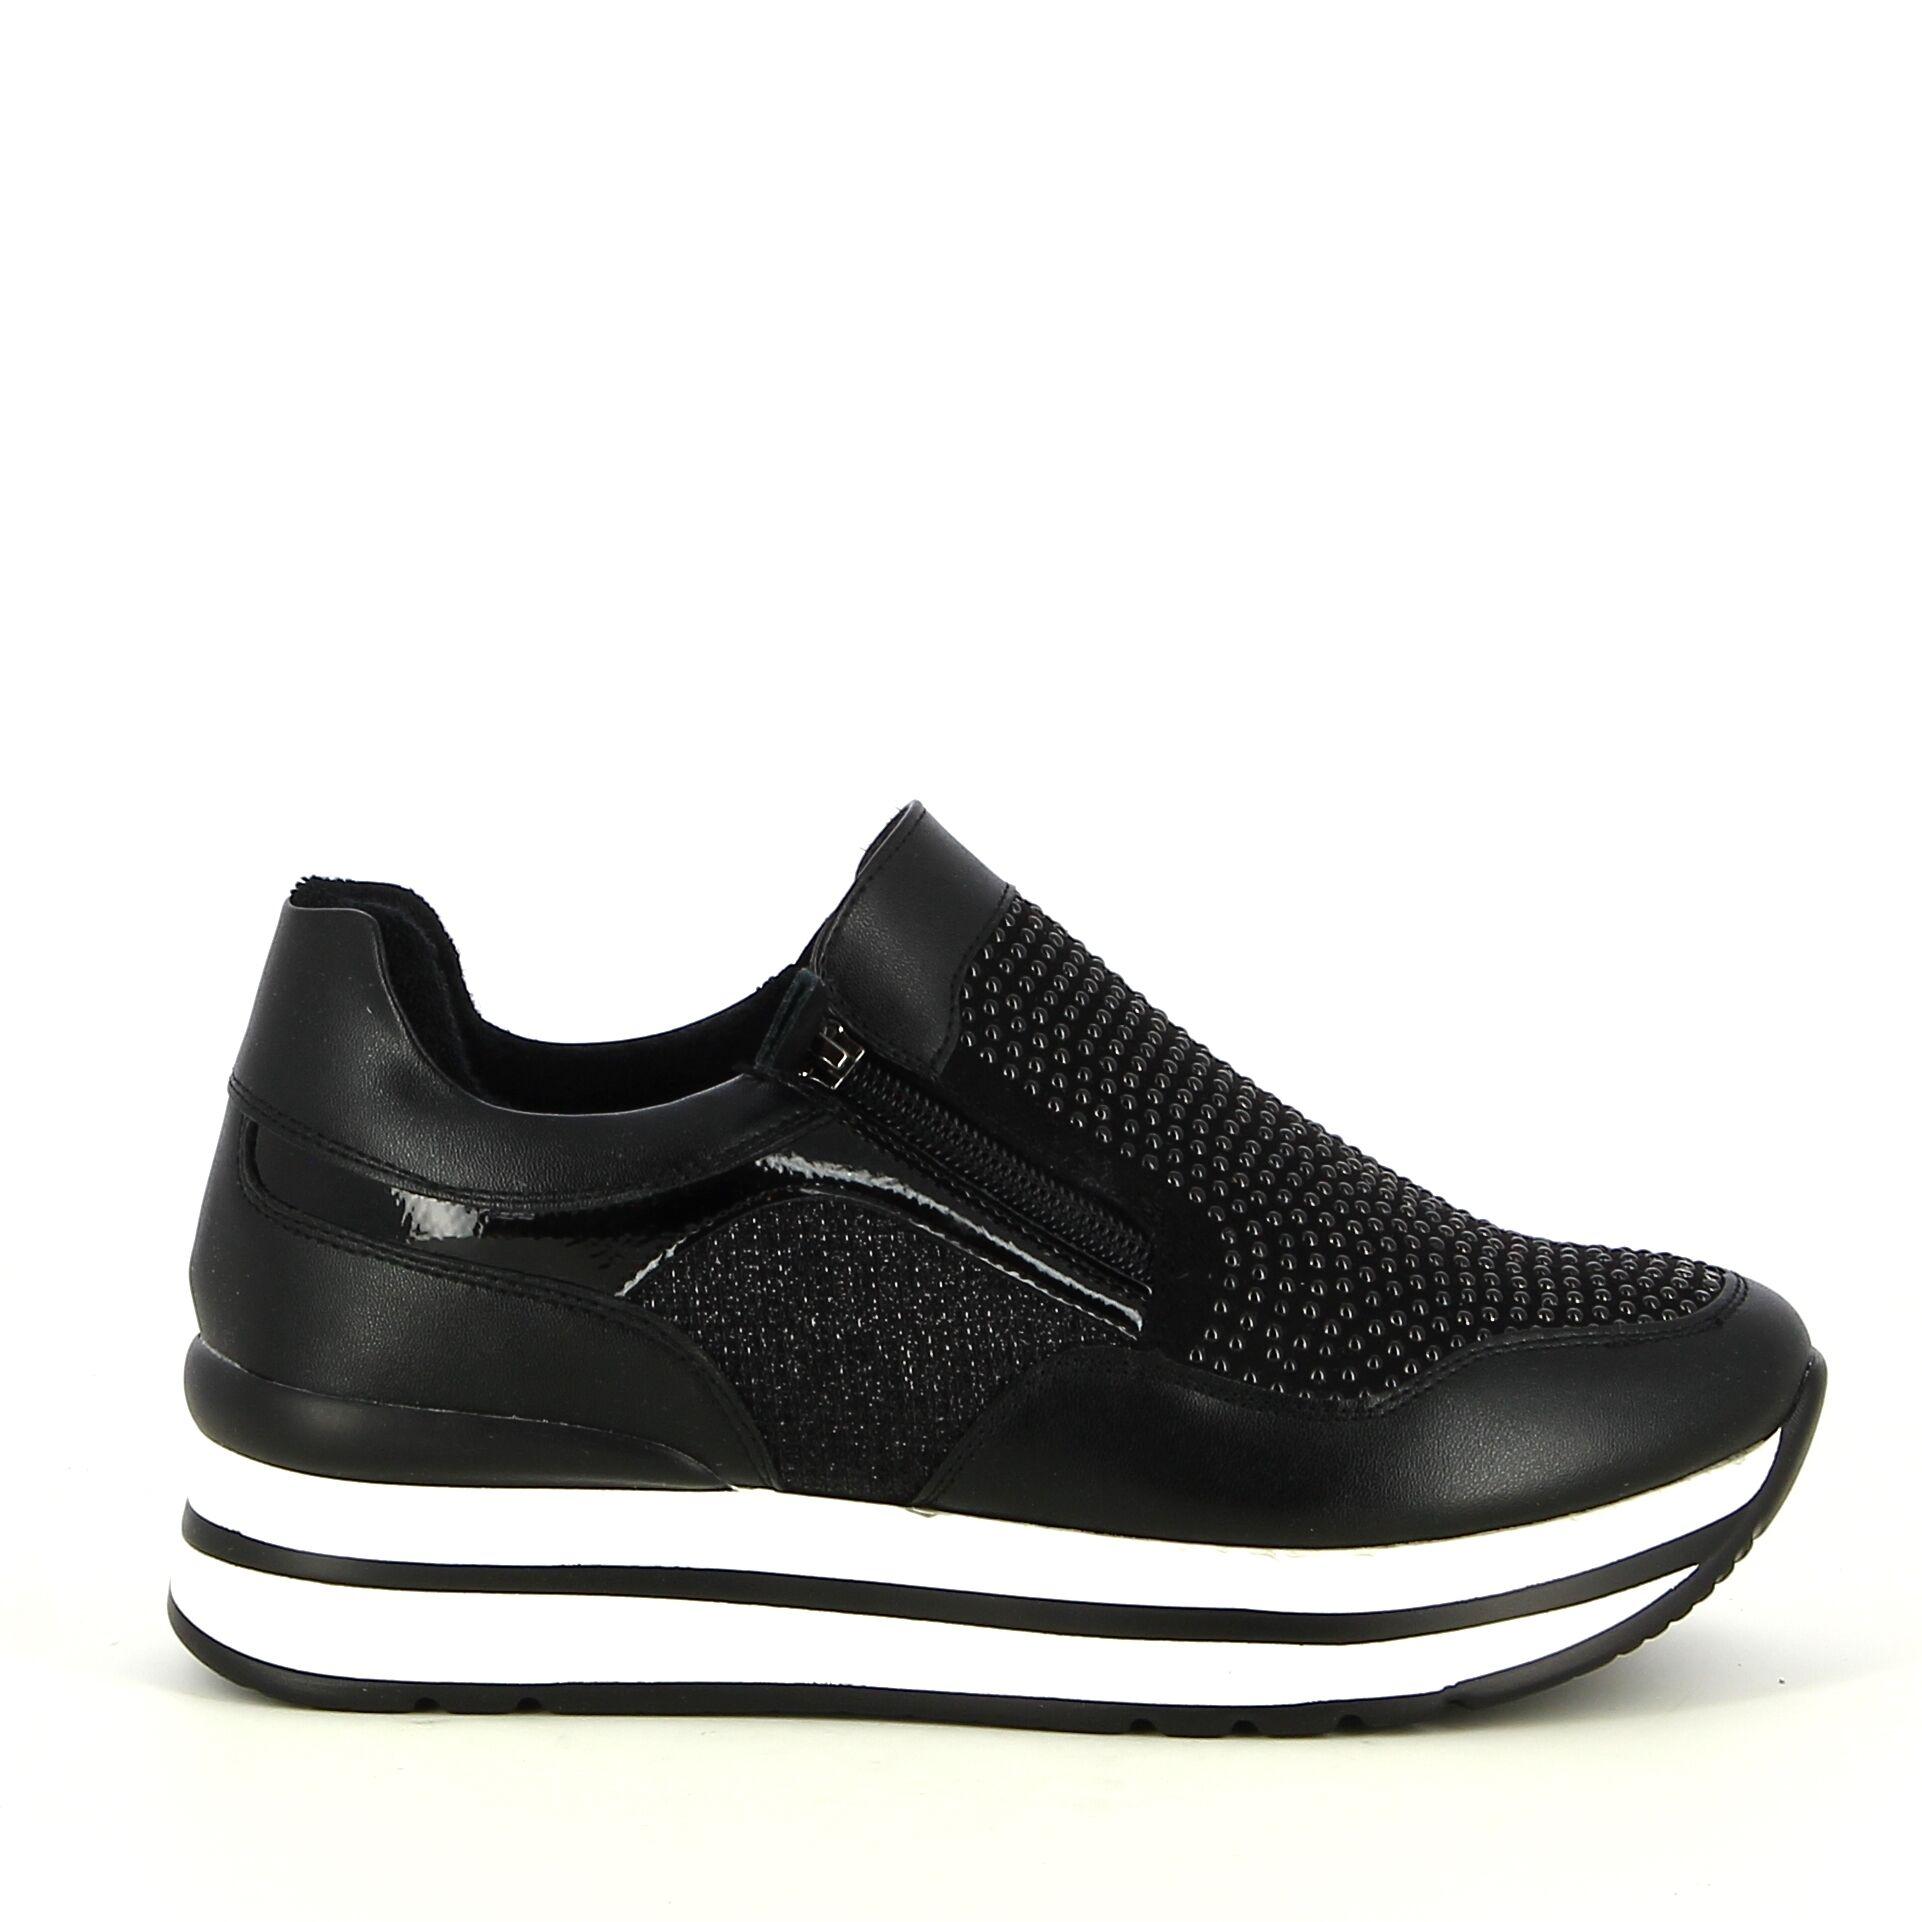 Ken Shoe Fashion - Noir - Baskets